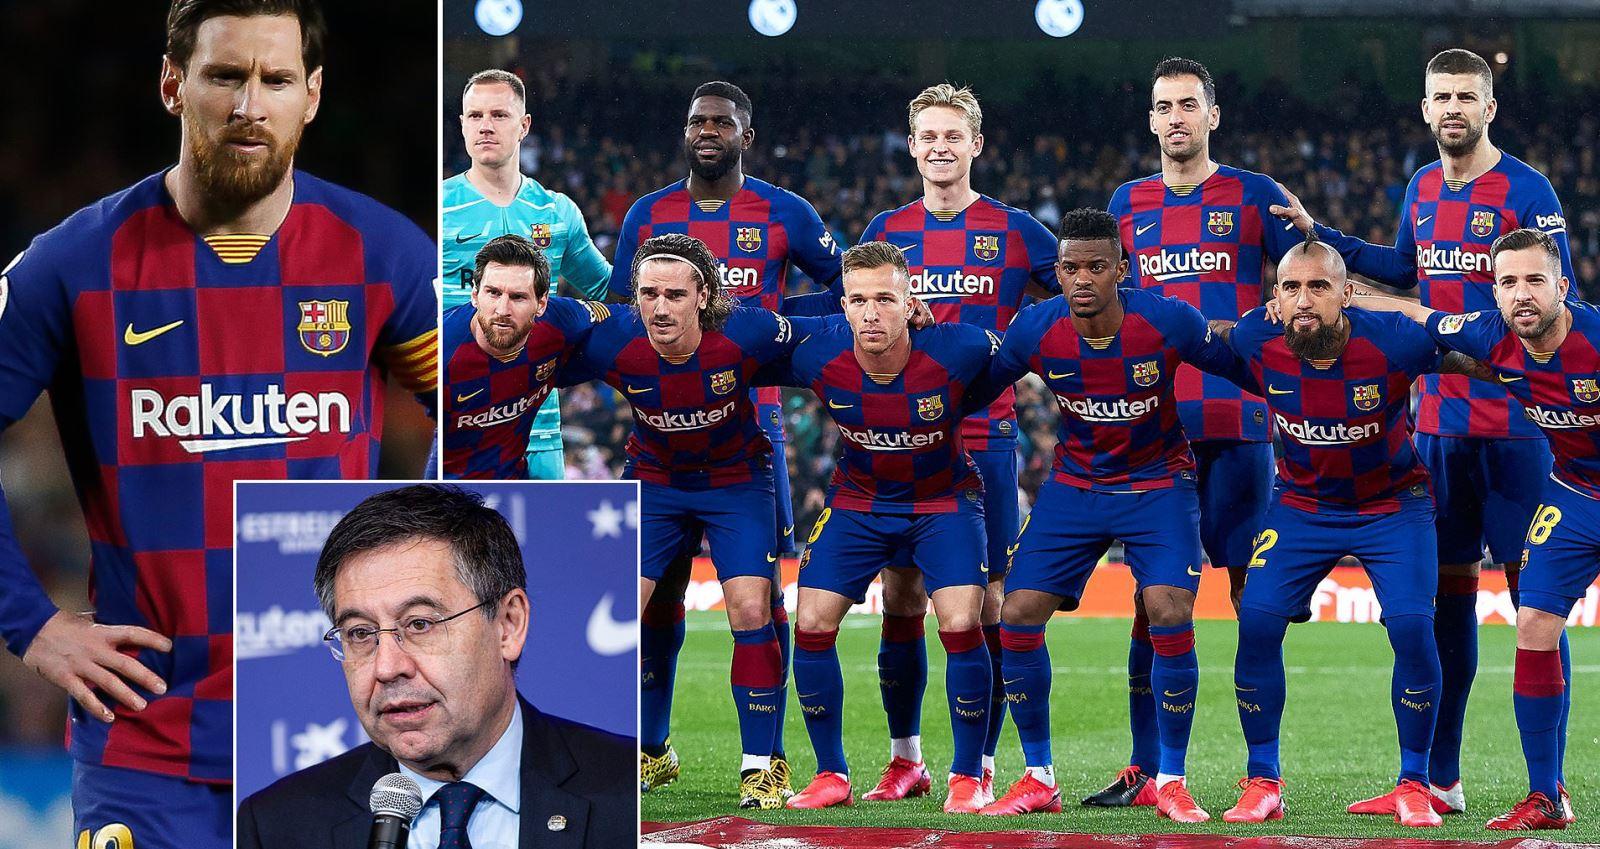 bóng đá, bong da, barcelona, barca, bartomeu, lionel messi, tin tức bóng đá, bong da hom nay, tin barcelona, chủ tịch barcelona